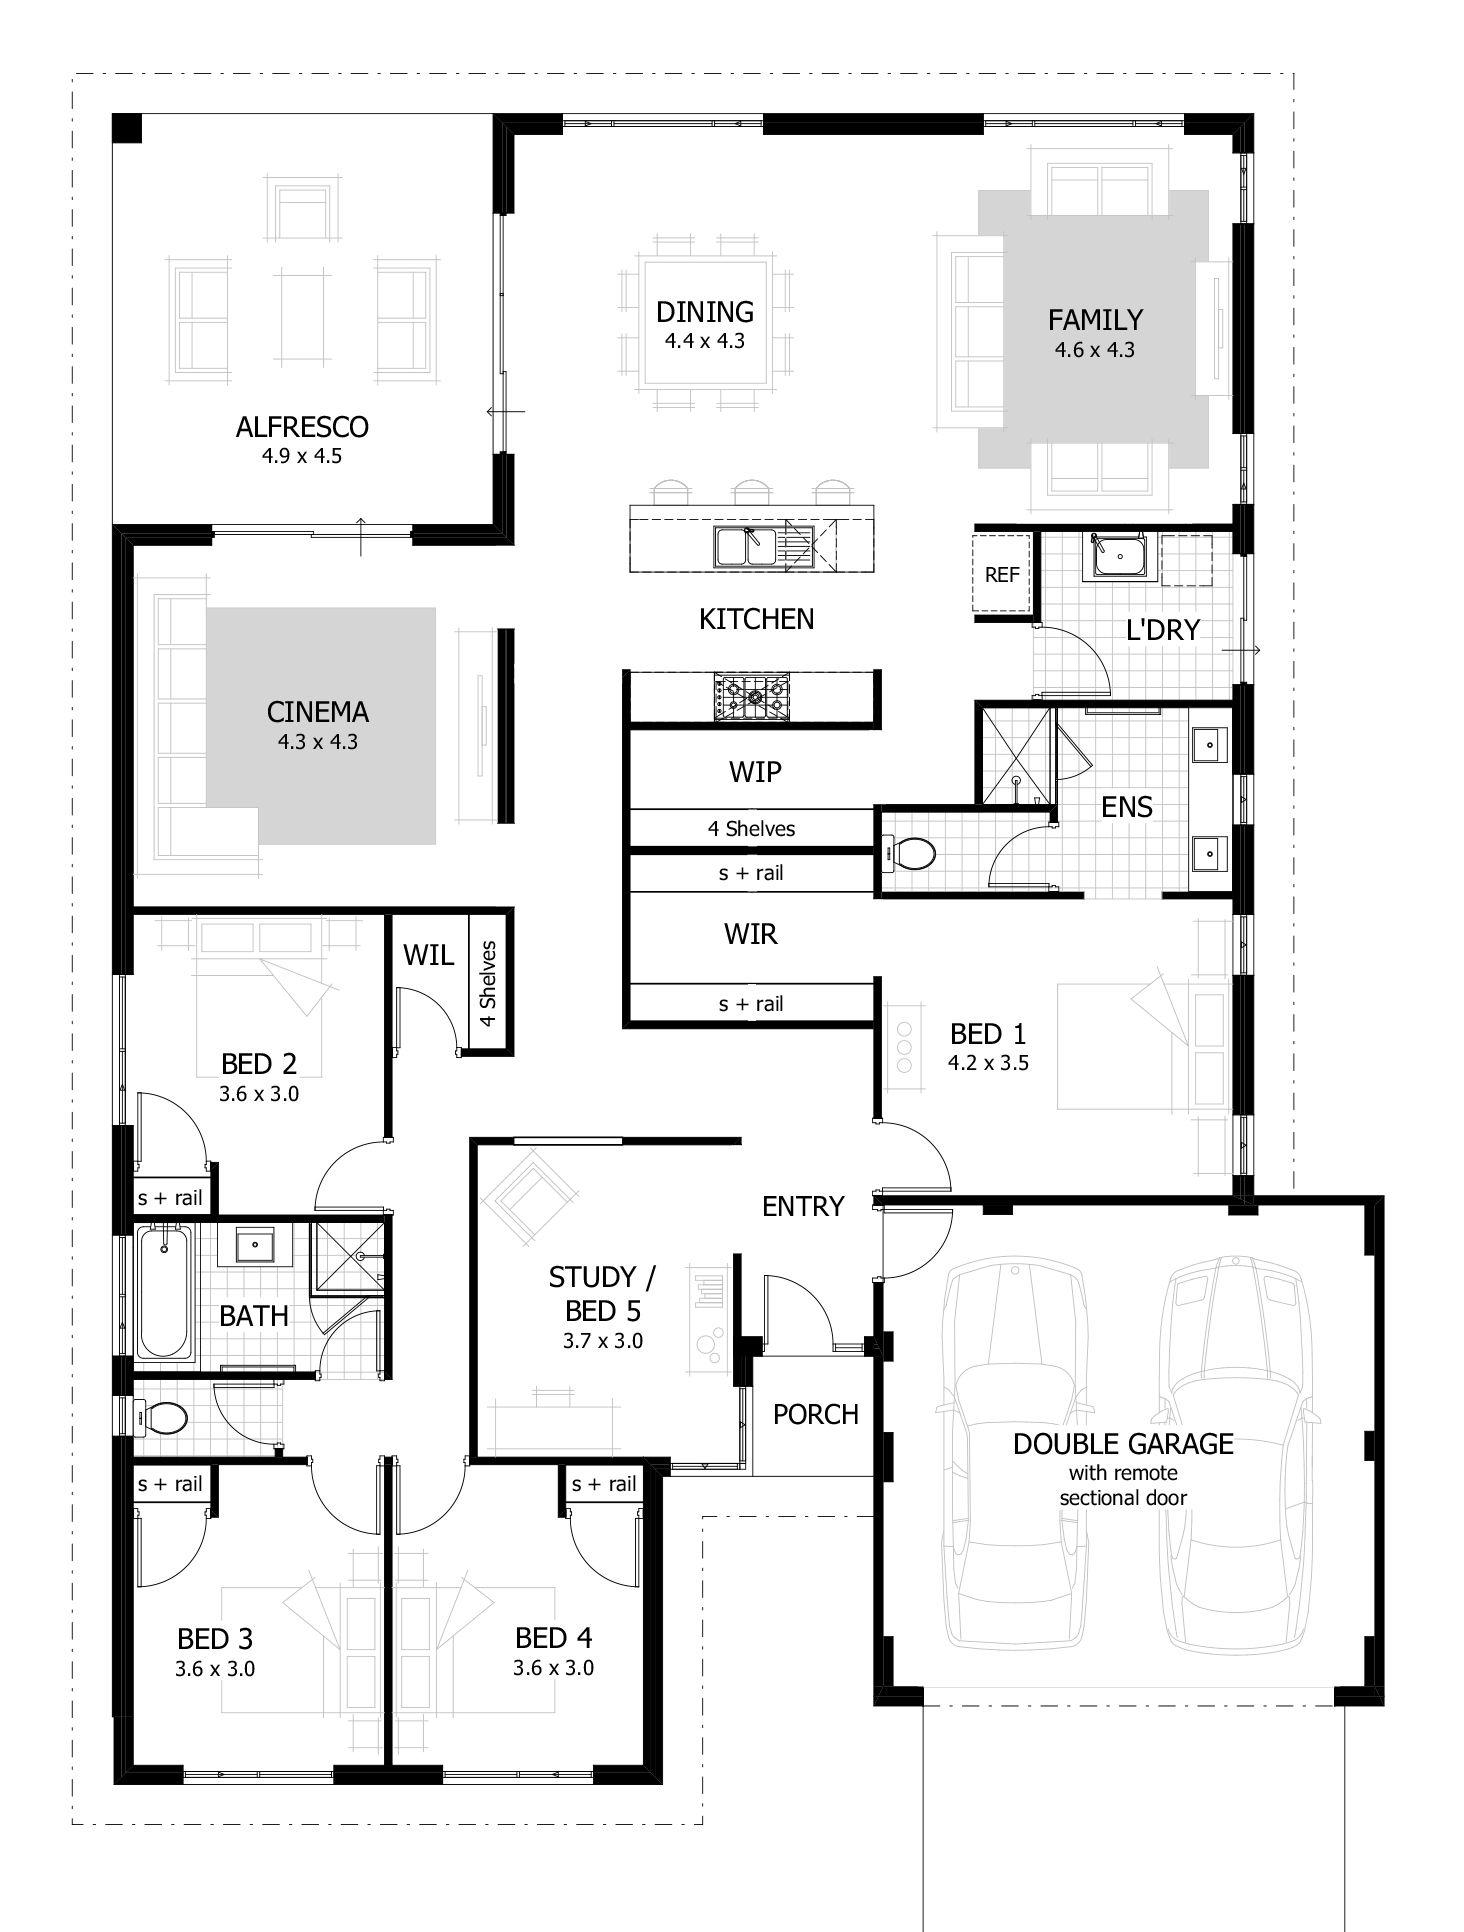 4 Bedroom House Plans Home Designs Celebration Homes Floor Plan Design Free House Plans Four Bedroom House Plans